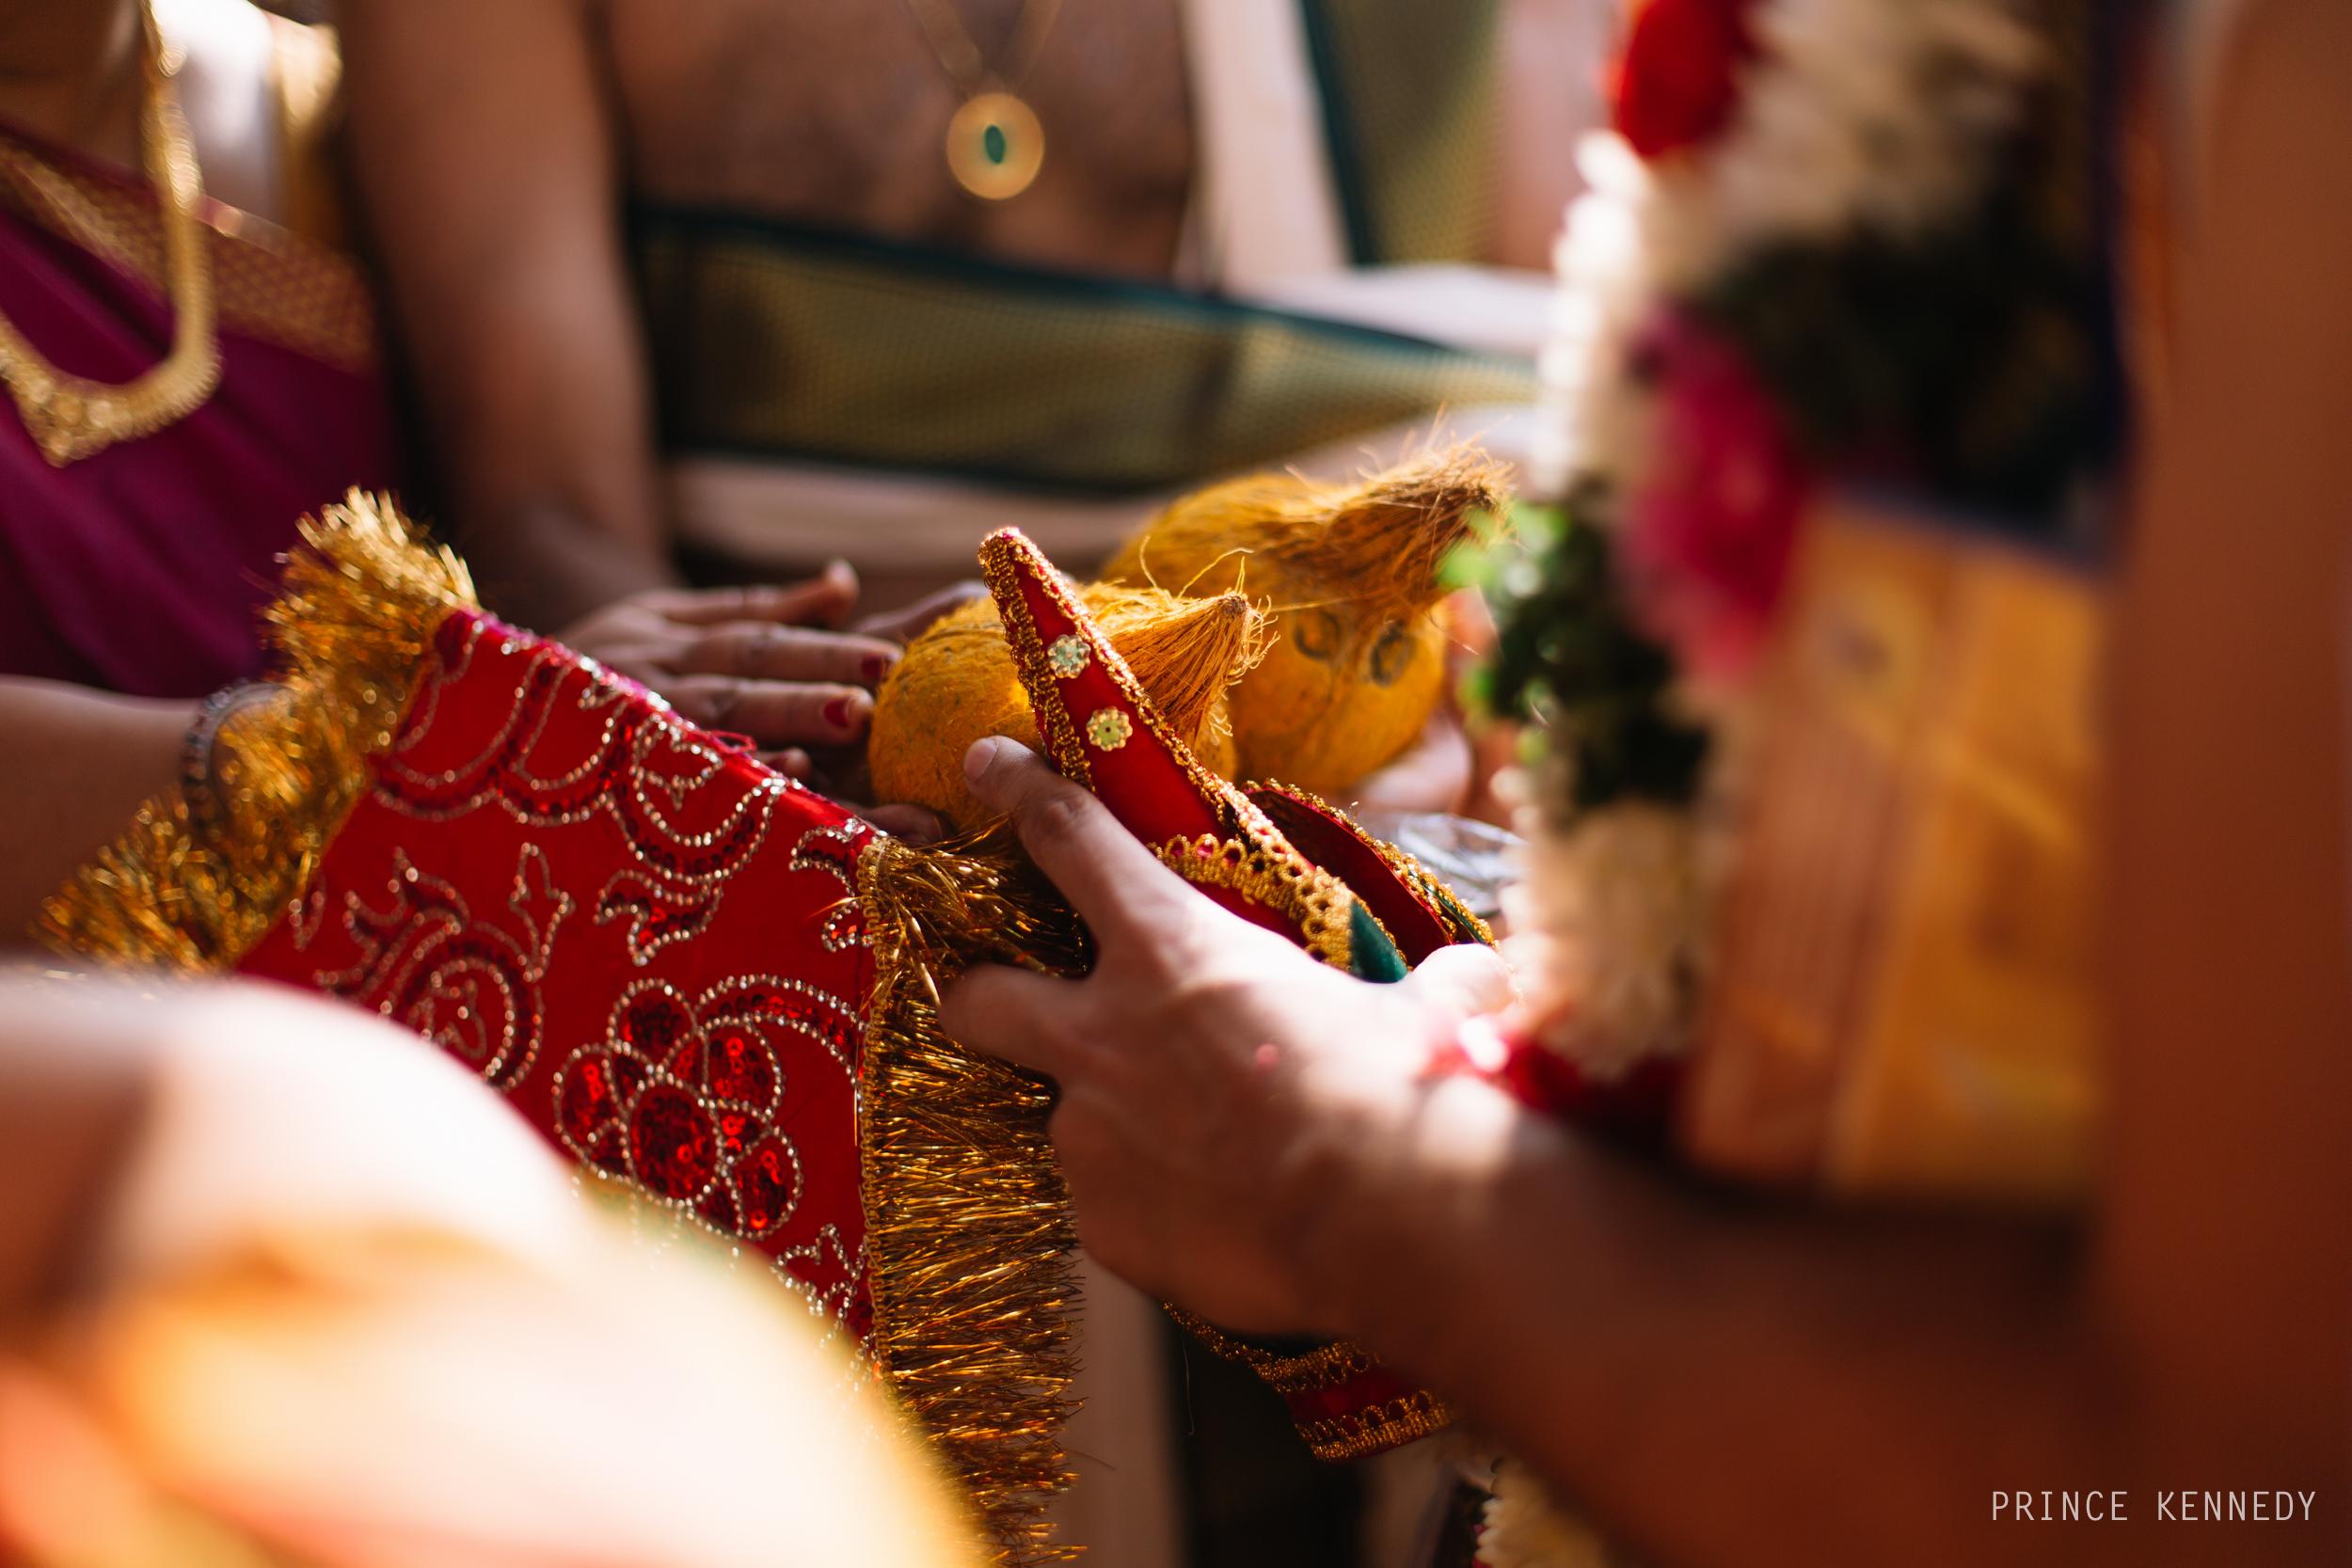 Athmajja-Nithesh-Engagement-Couple-Portrait-Portraiture-Wedding-Couple-Portrait-Chennai-Photographer-Candid-Photography-Destination-Best-Prince-Kennedy-Photography-64.jpg